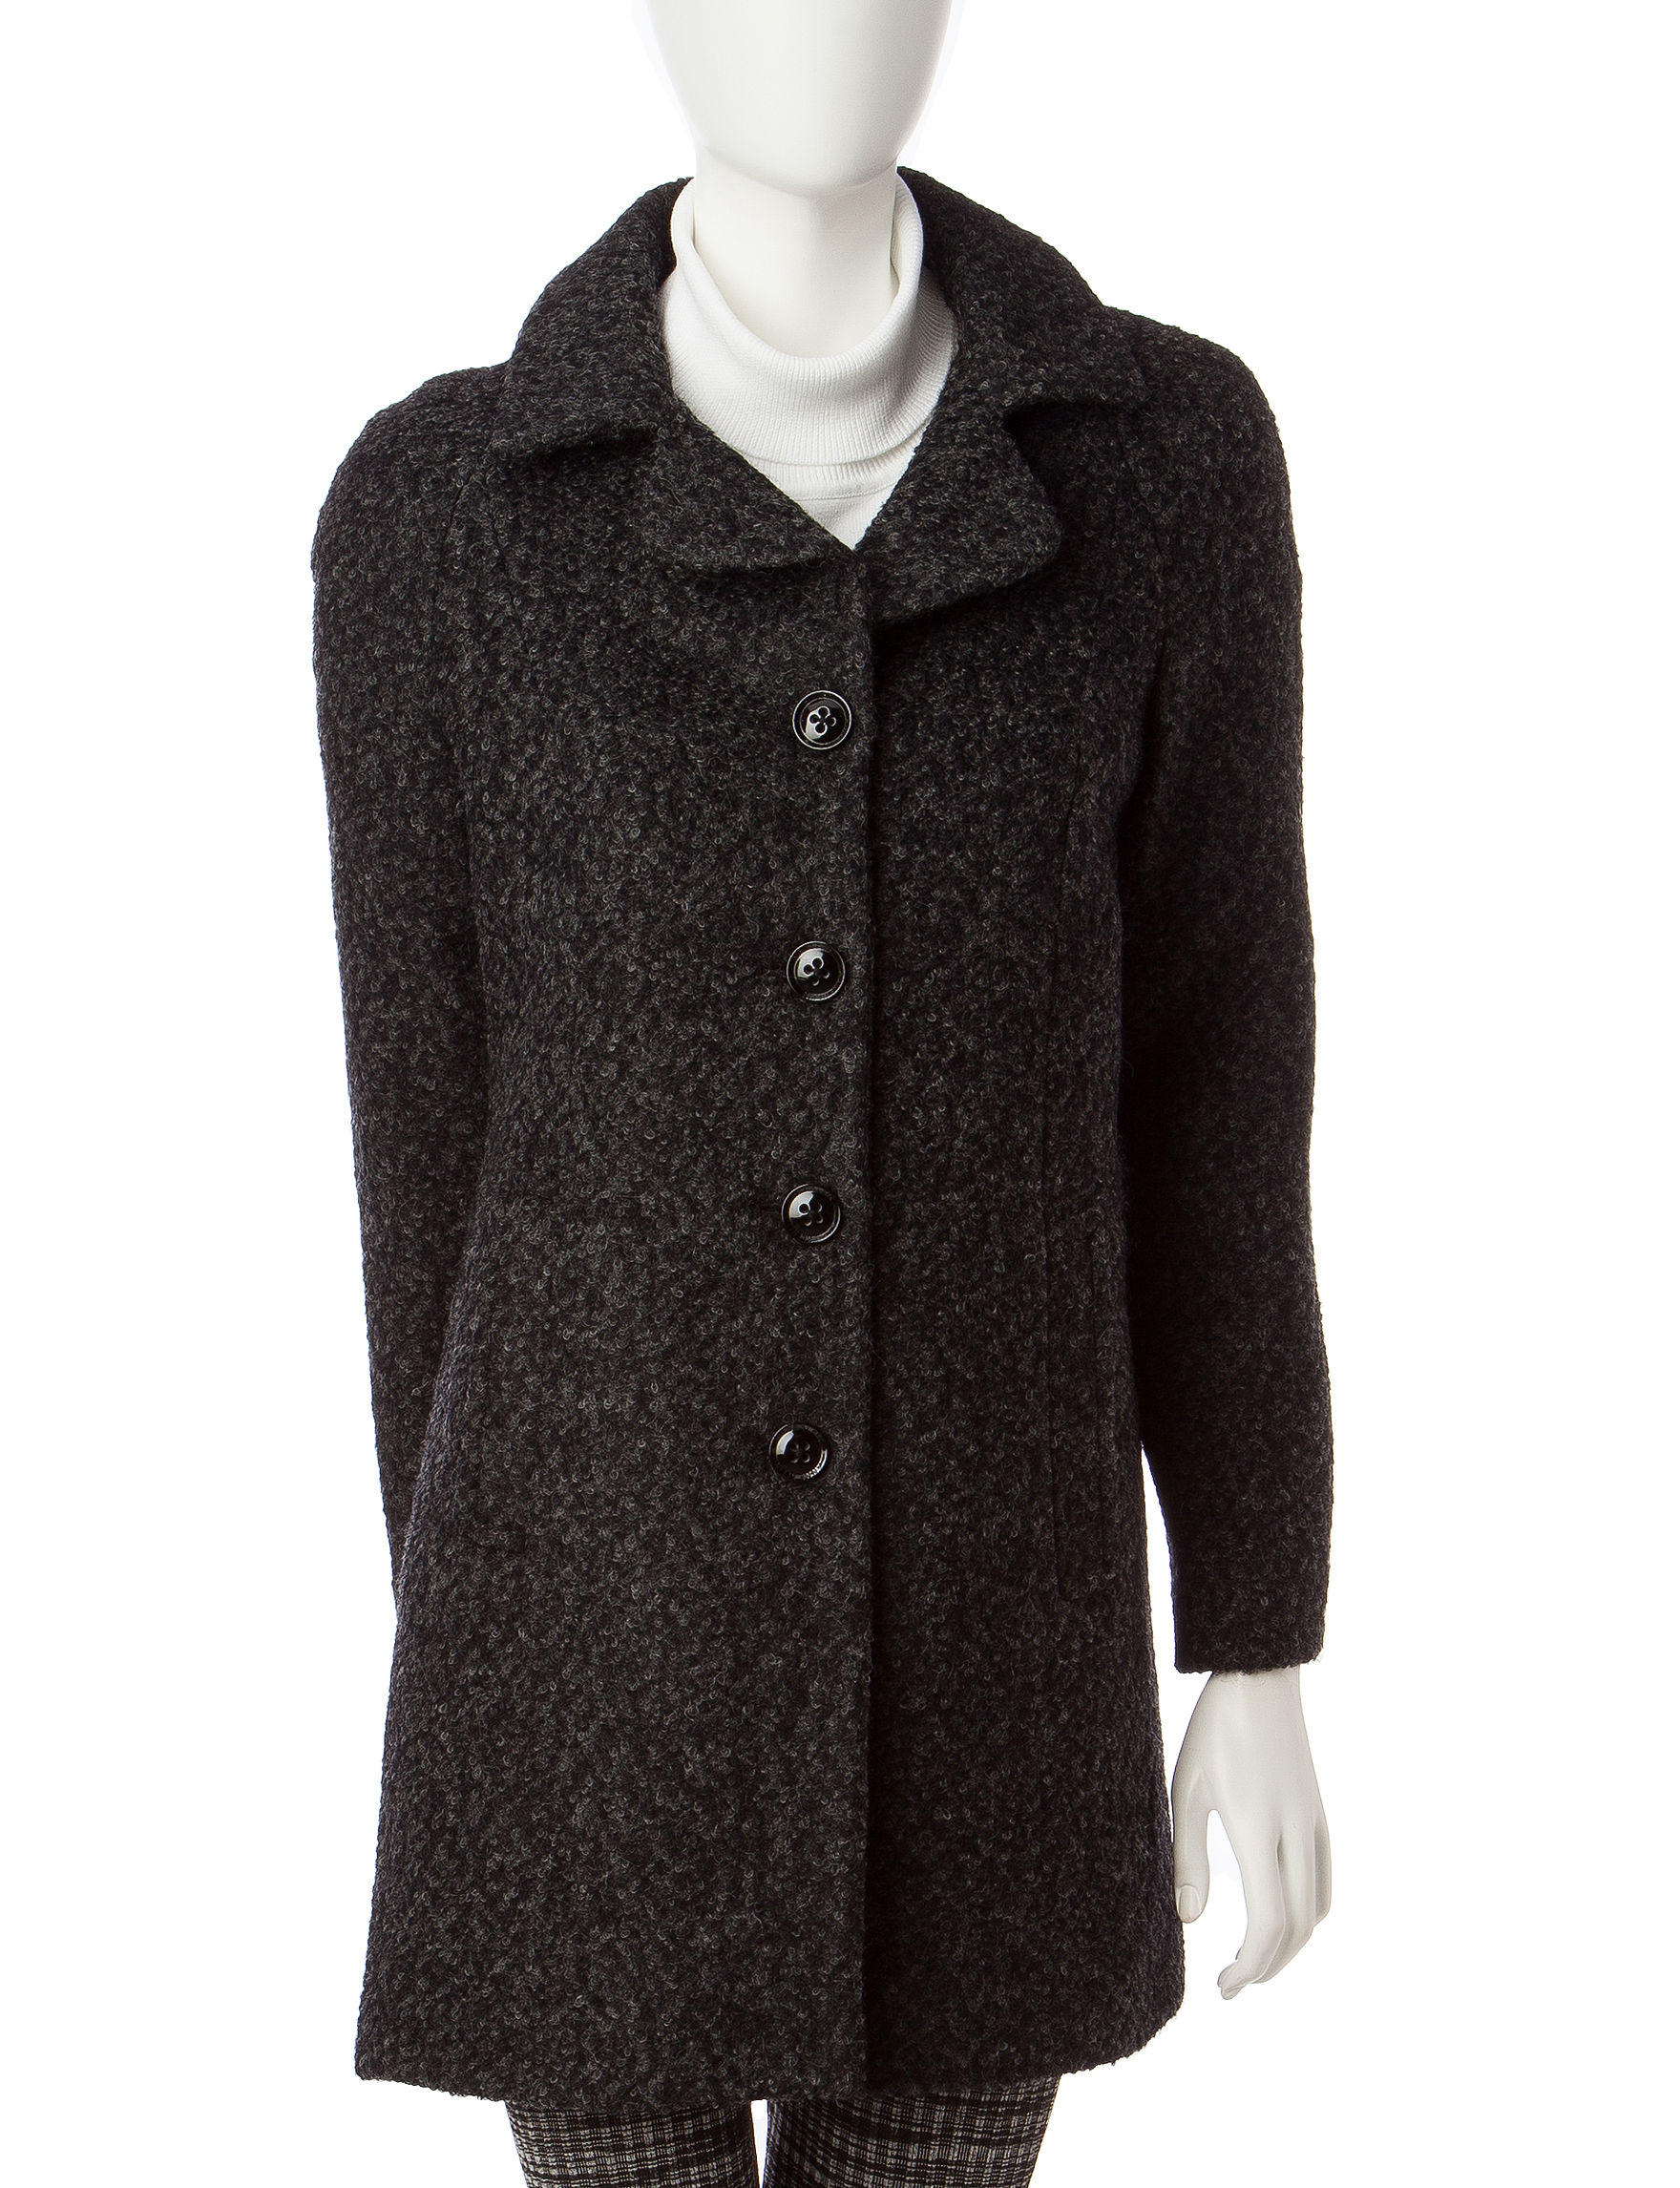 Anne Klein Dark Grey Peacoats & Overcoats